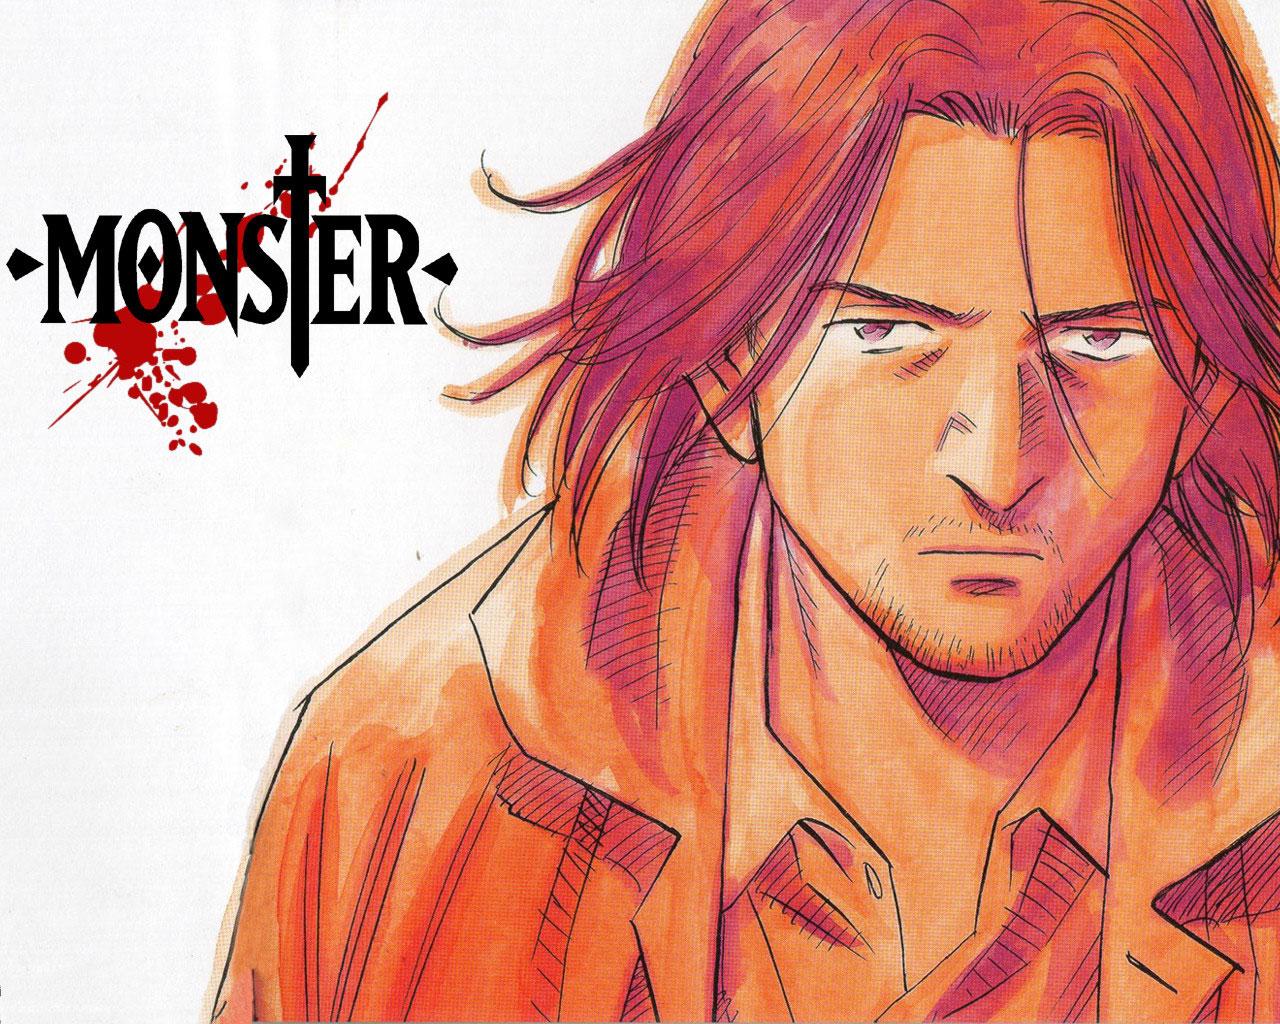 Monster - Naoki Urasawa